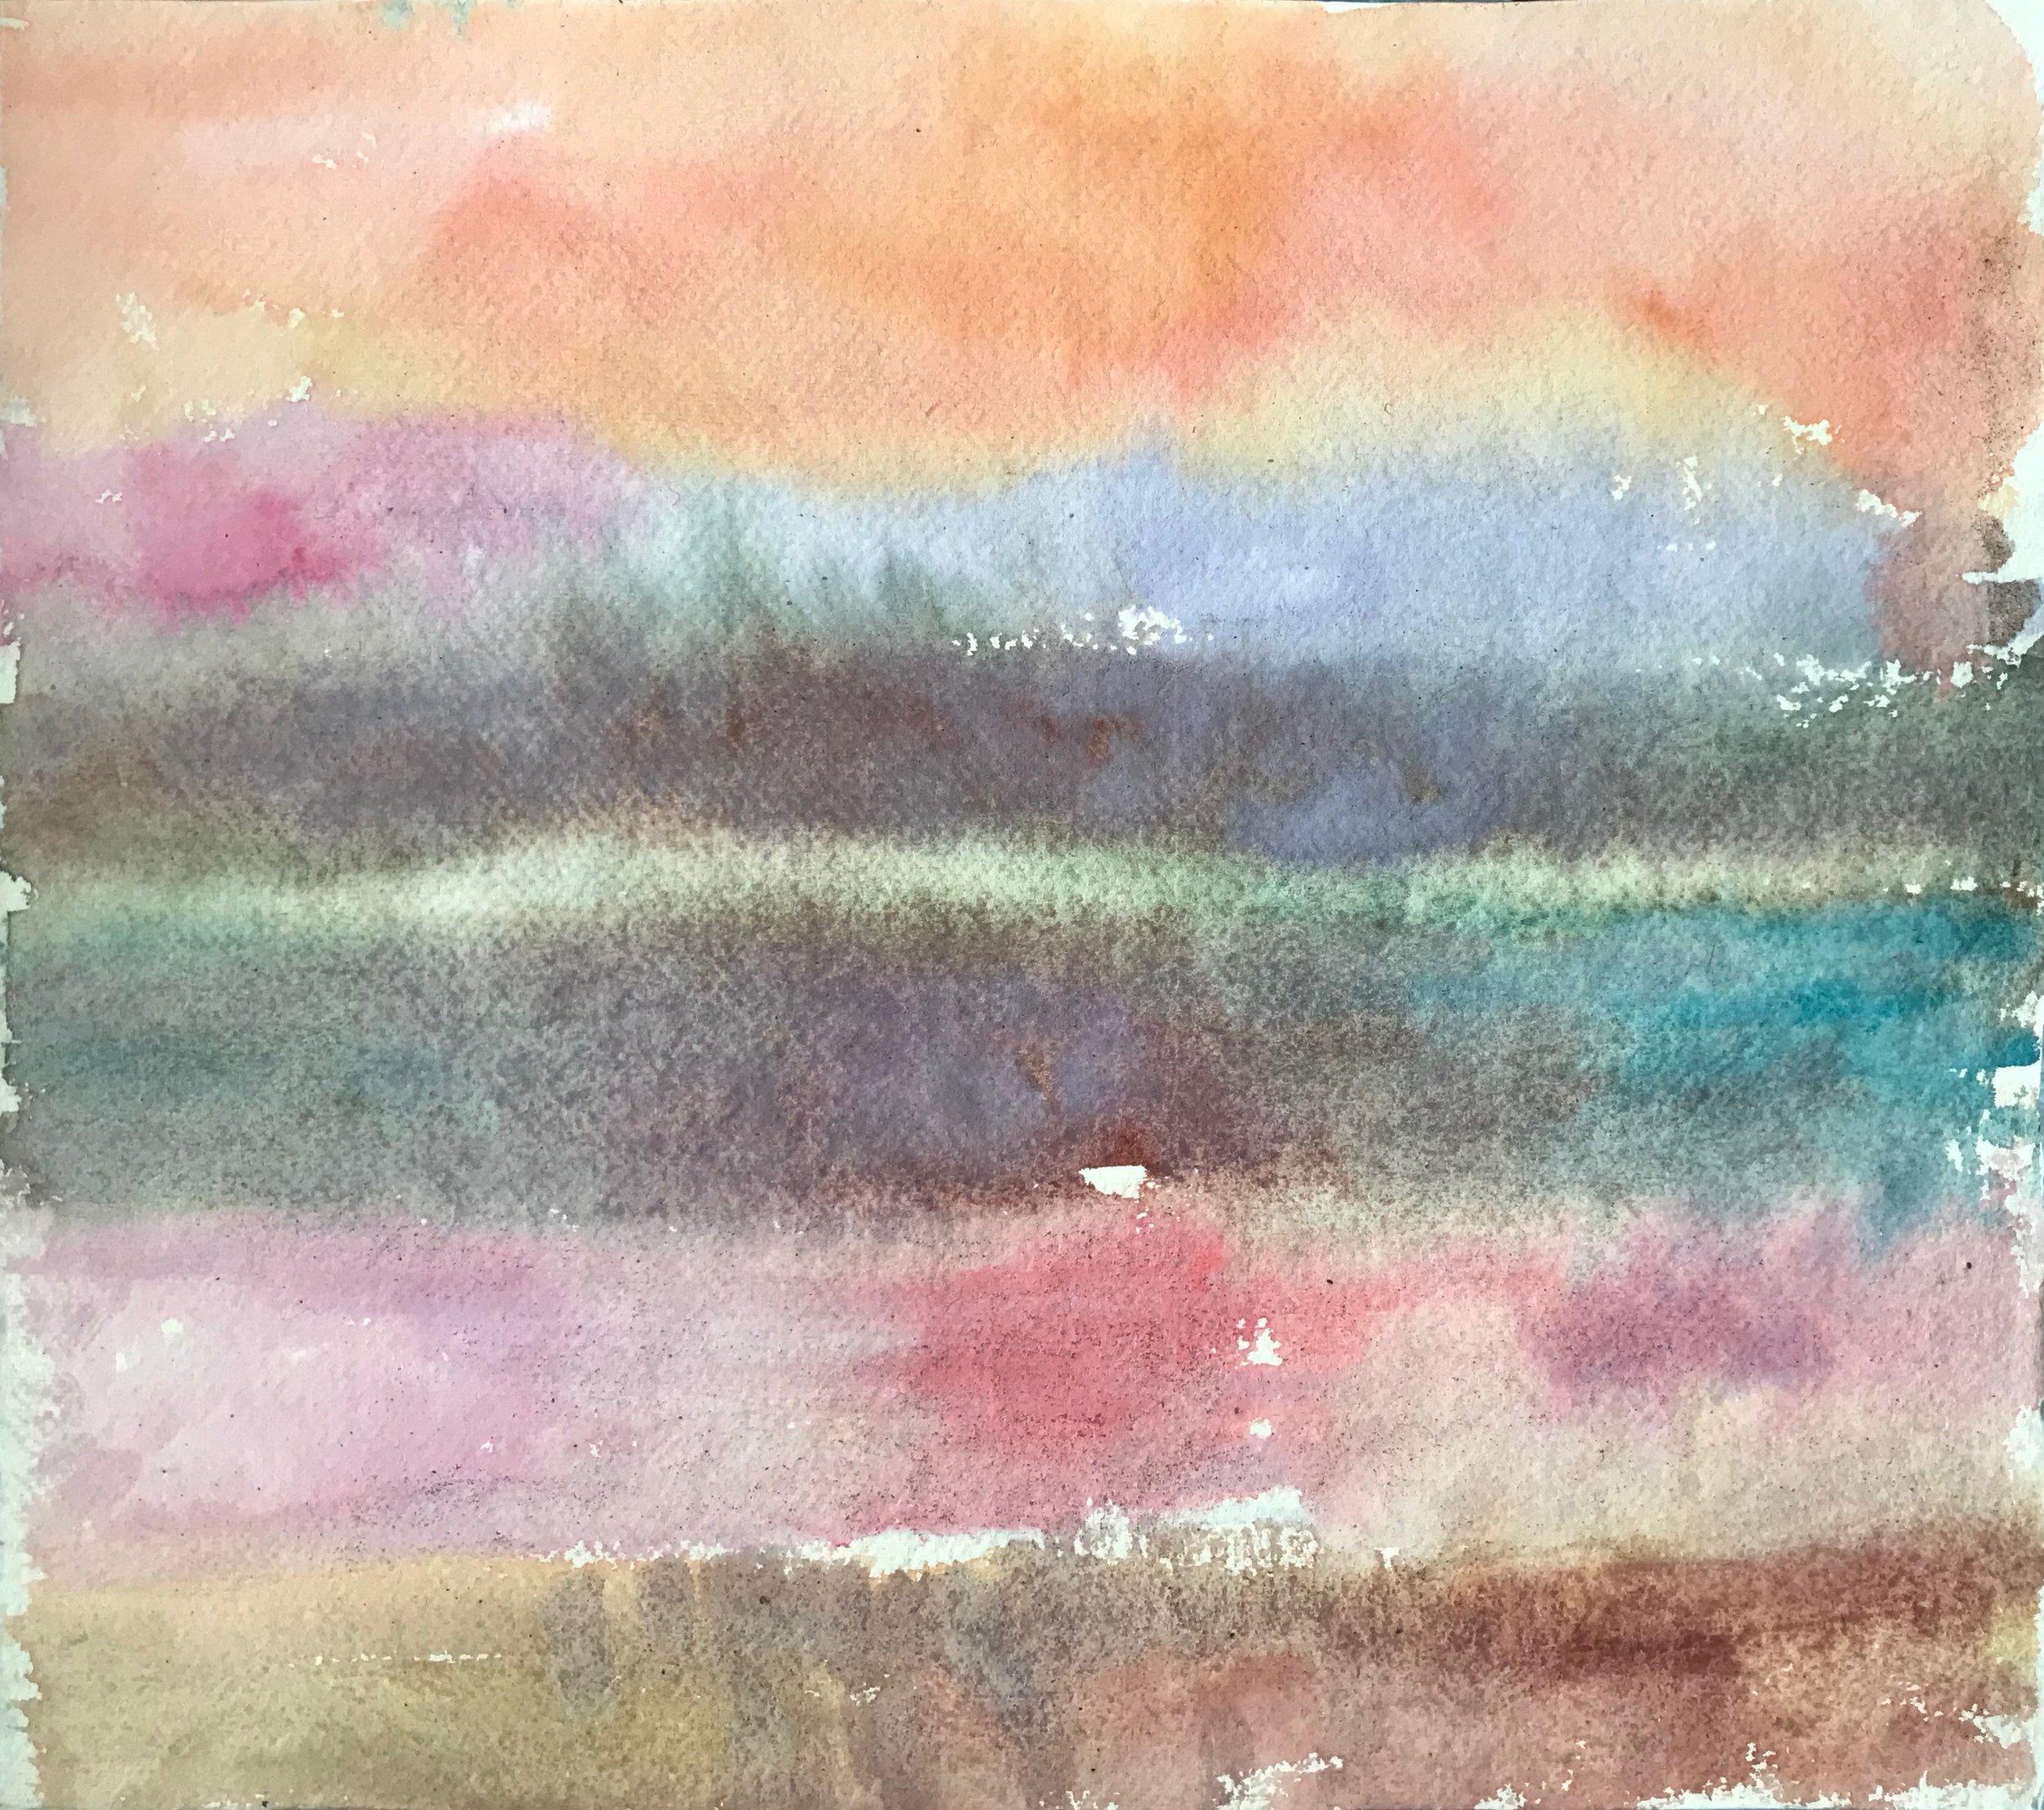 Sunrise study 6 (Ganges),30x34cm.jpeg